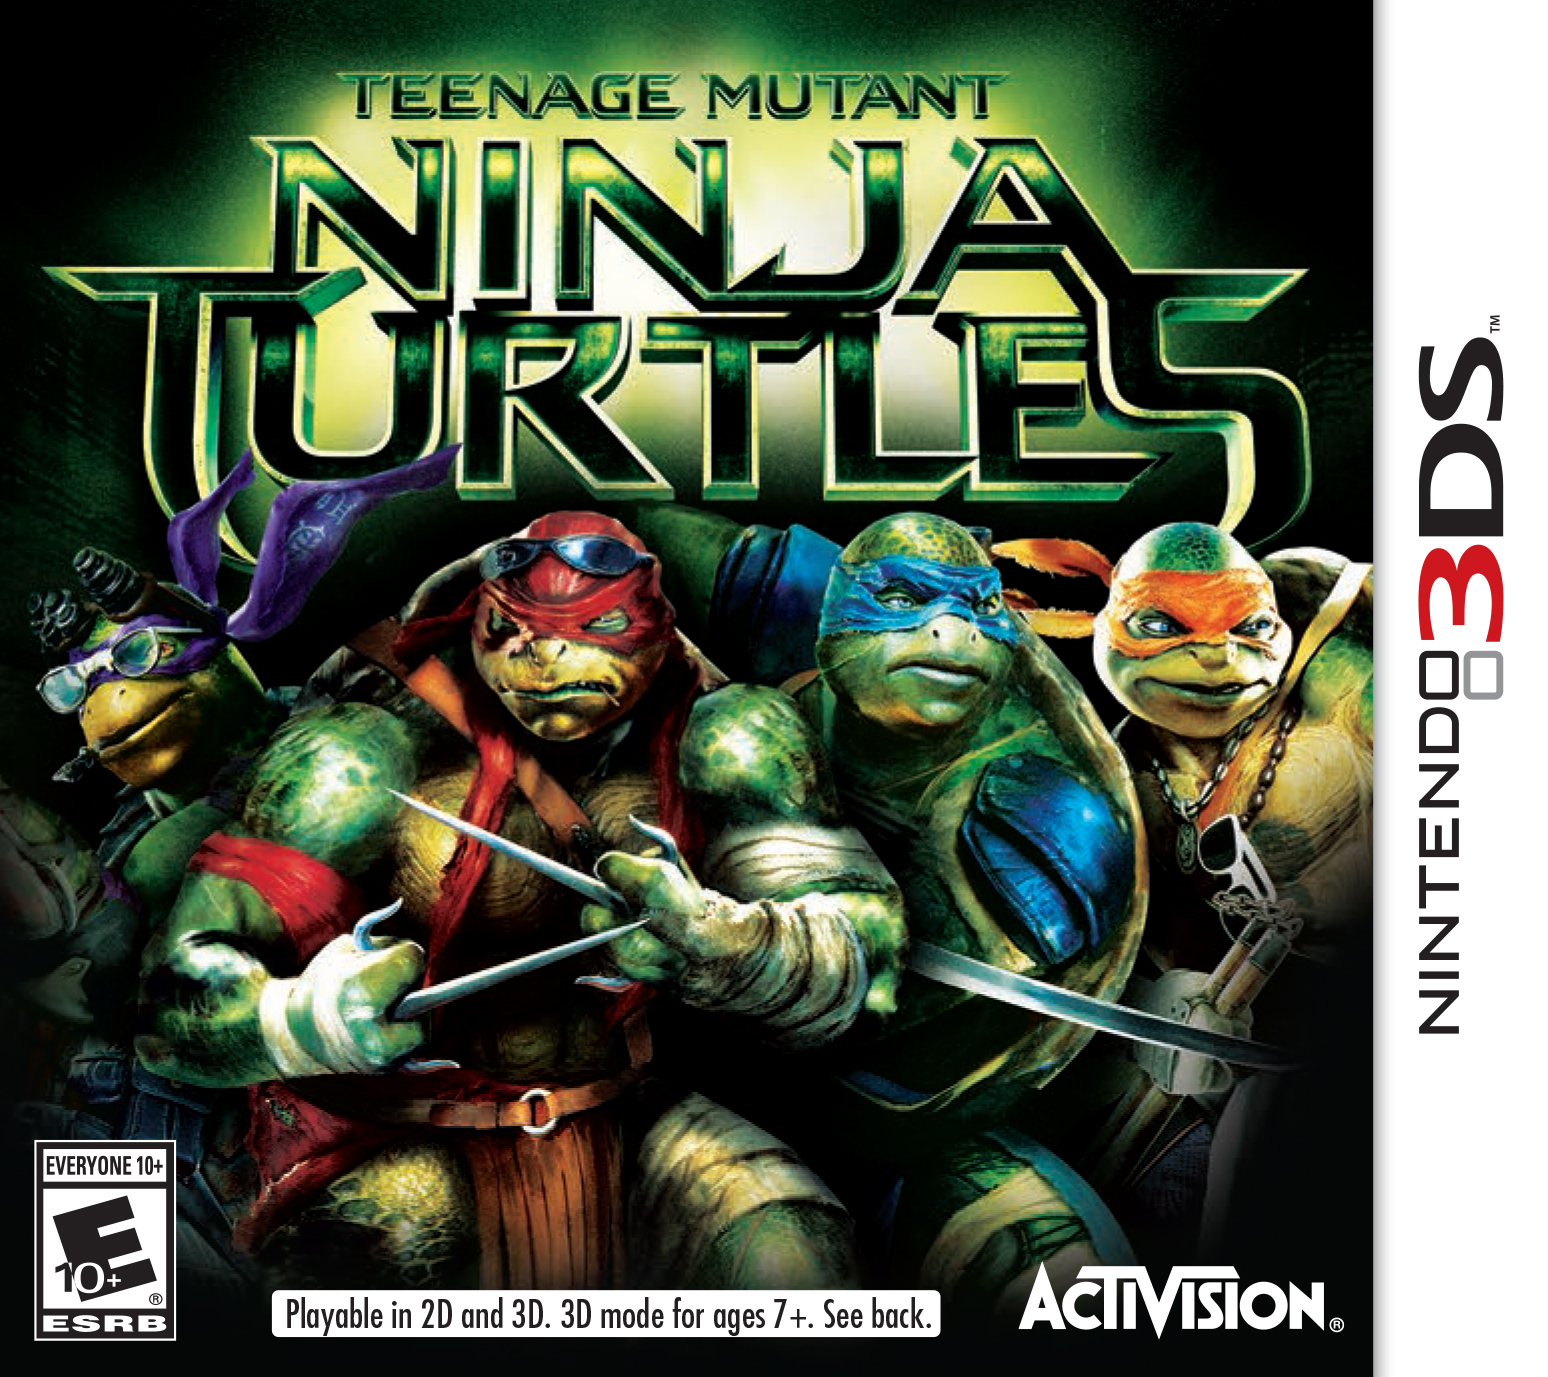 teen age mutant ninja